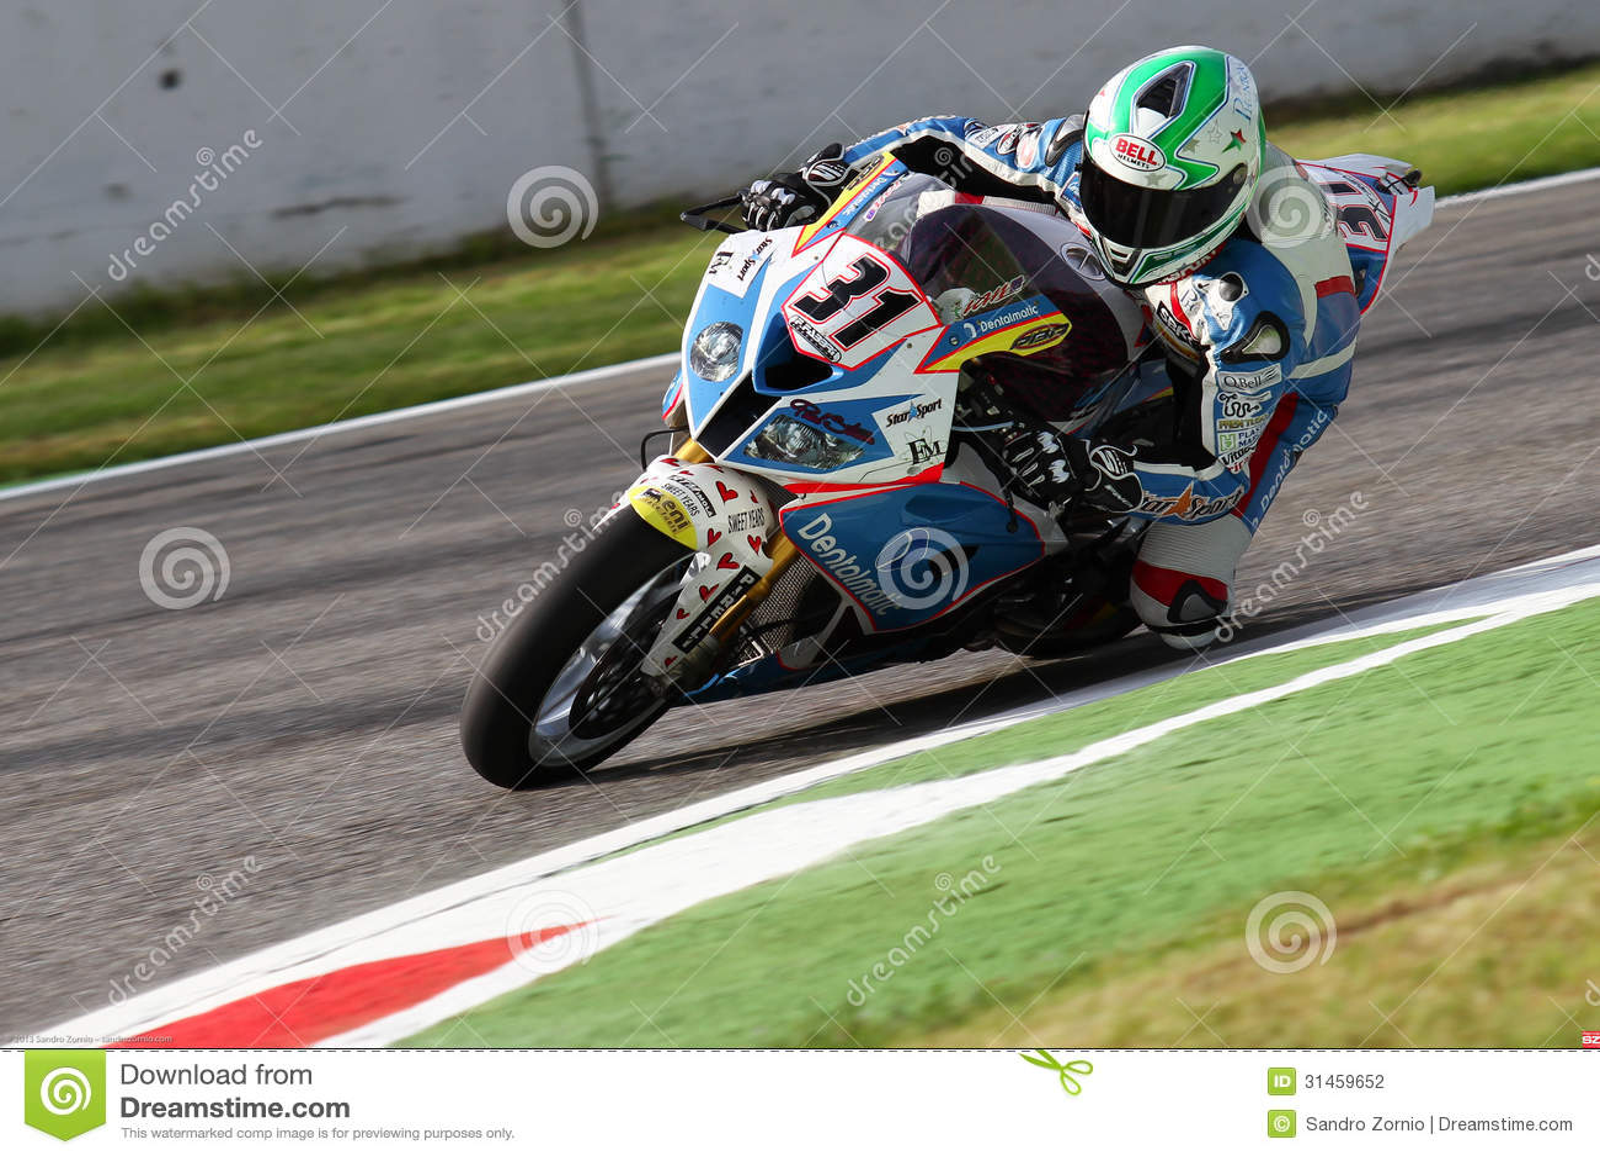 Vittorio Iannuzzo #31 on BMW S1000 RR with Grillini DENTALMATIC SBK Team WSBK